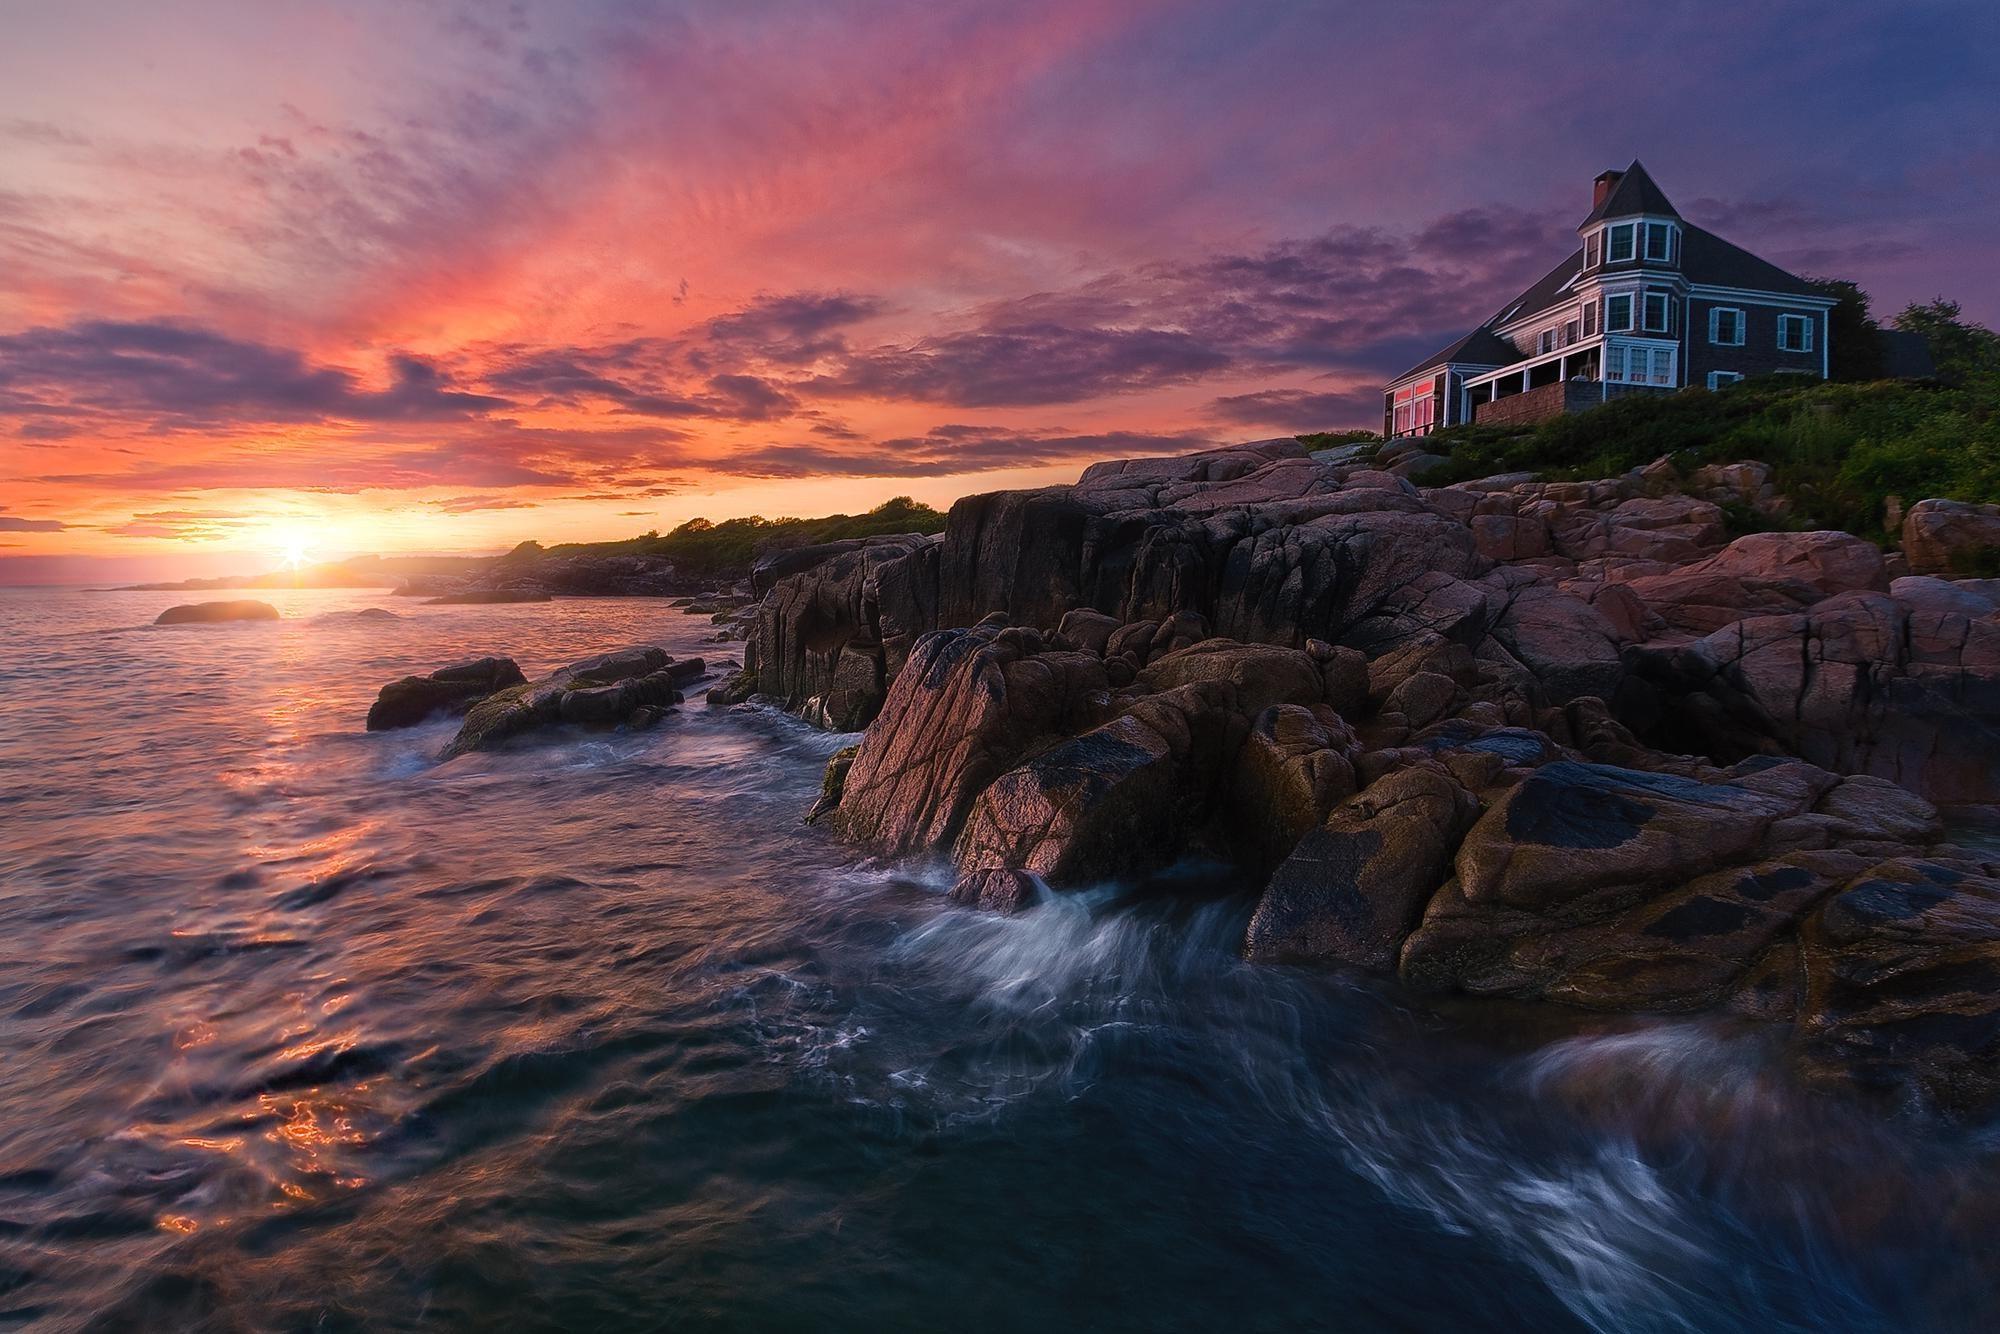 maine wallpaper,sky,nature,natural landscape,photograph,sea